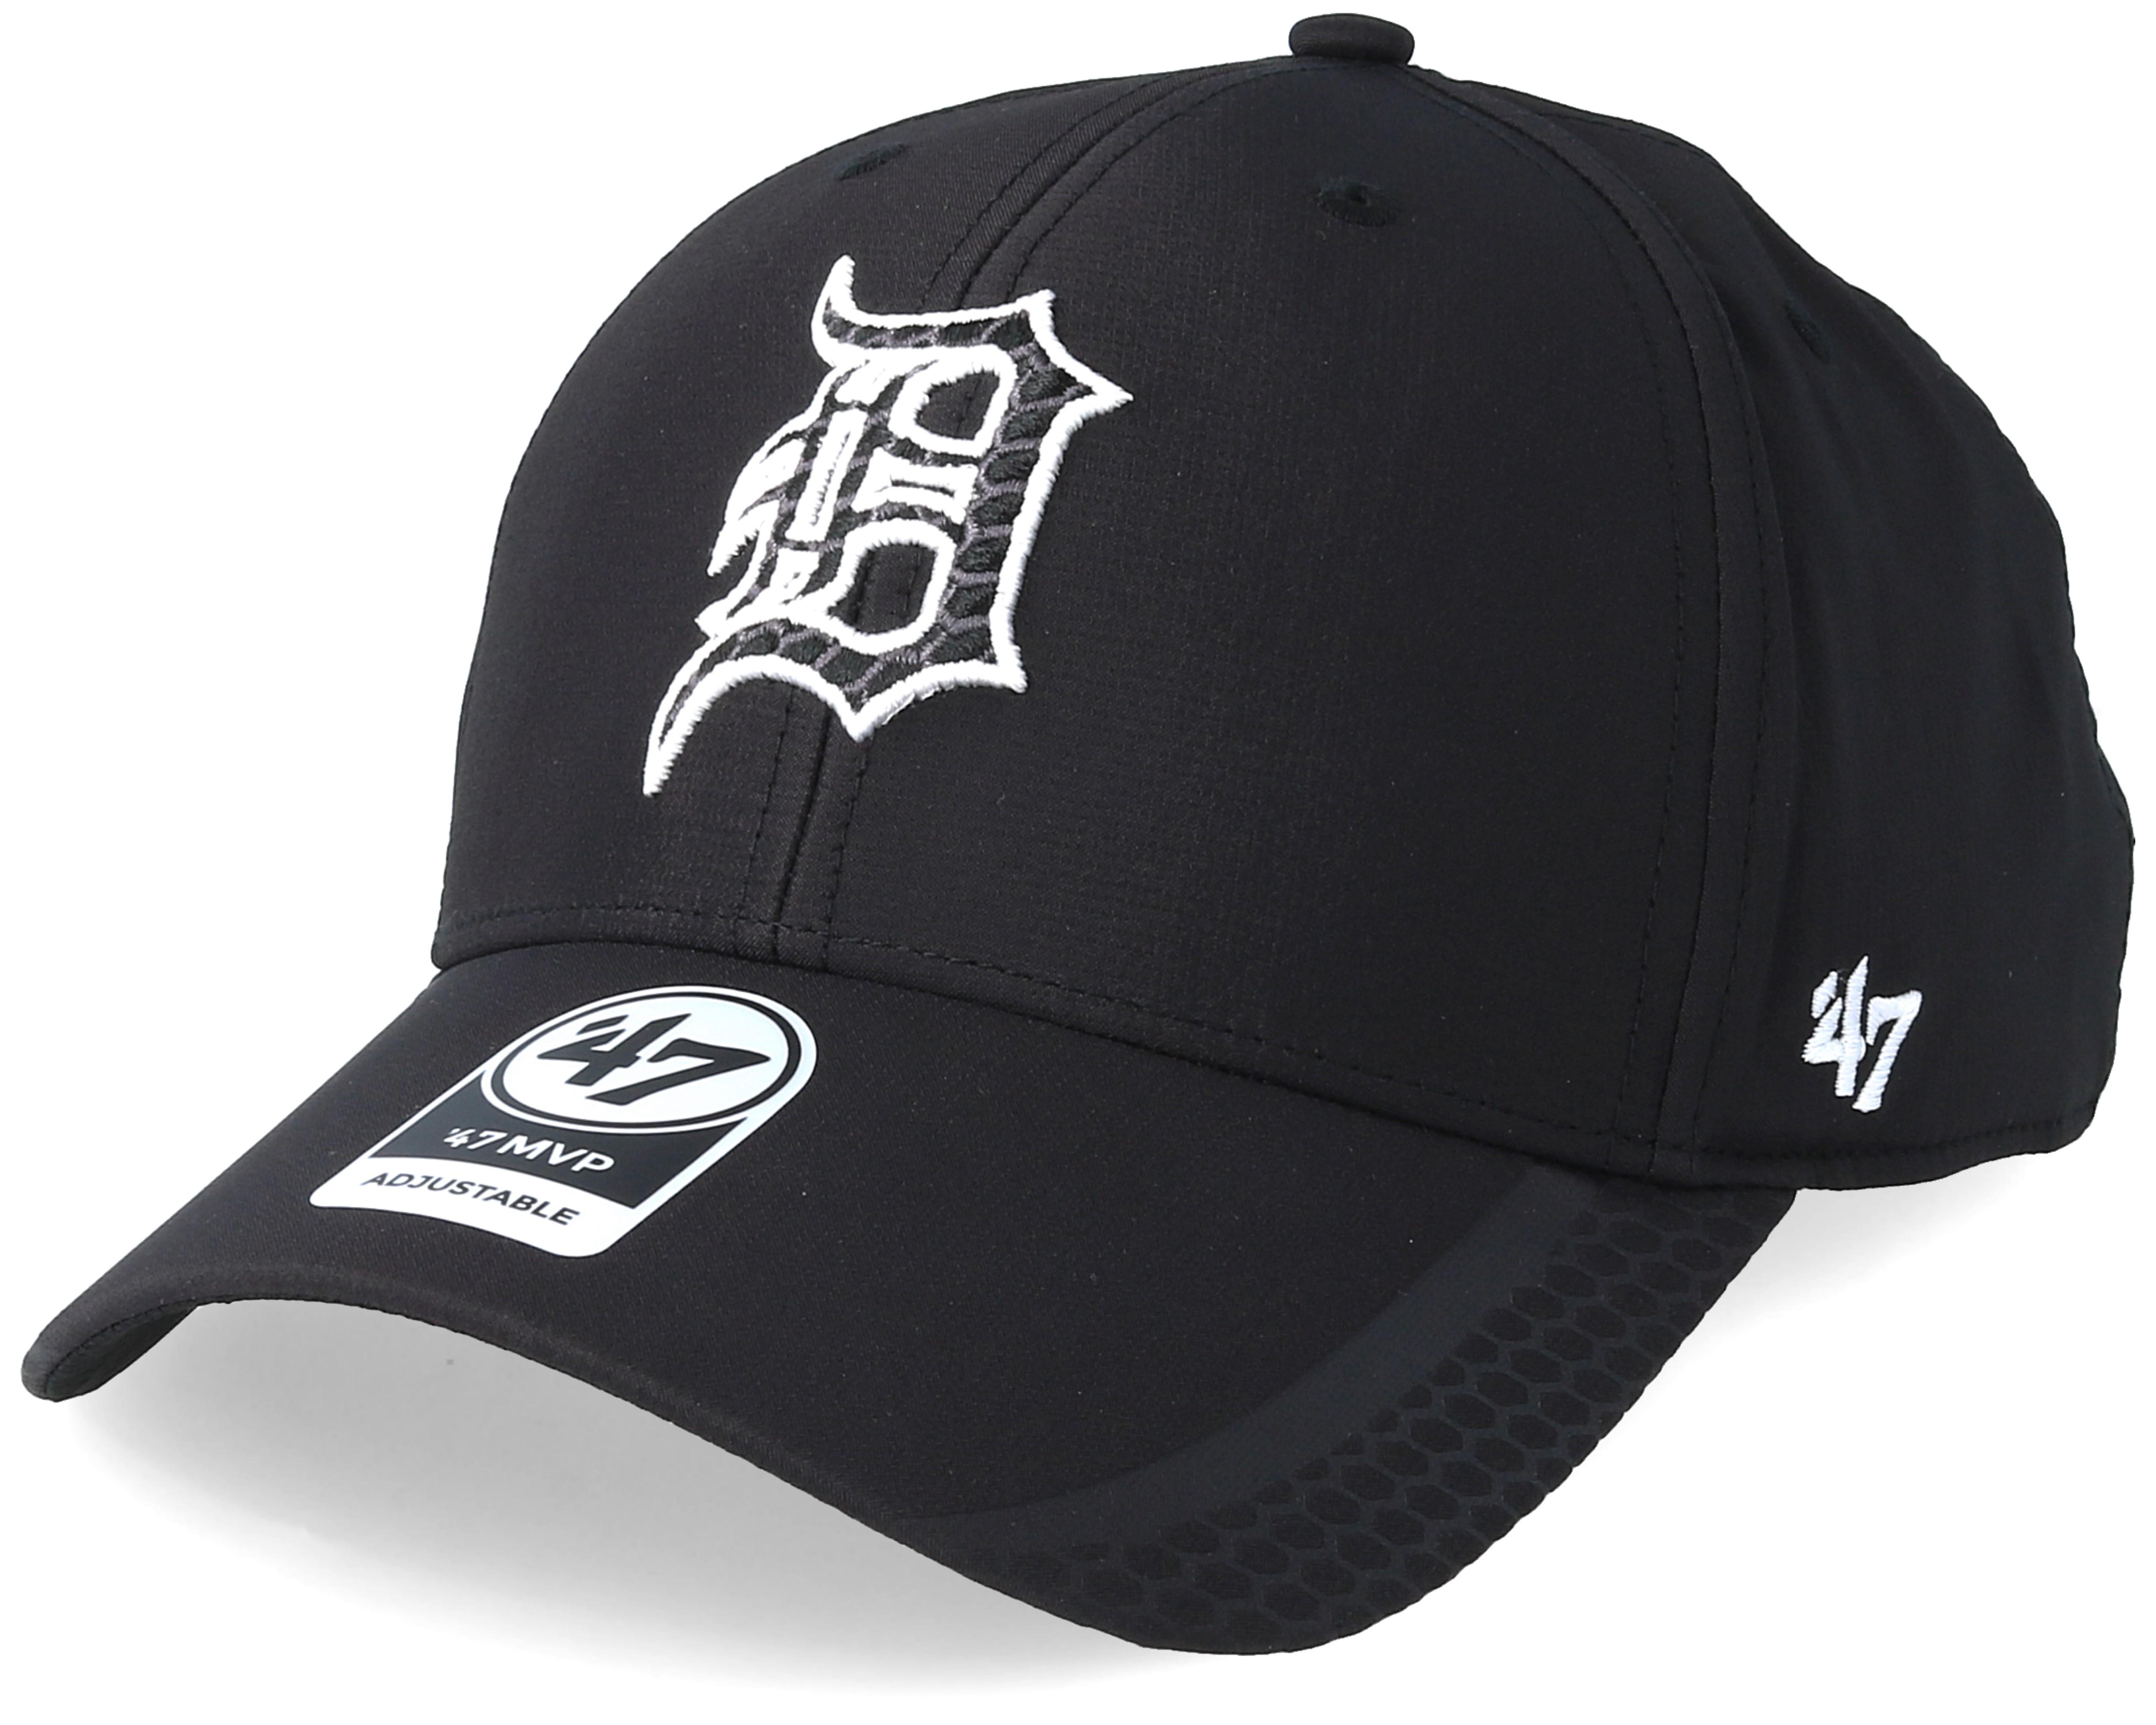 60a9f834b Detroit Tigers Osmosis 47 Mvp Black Adjustable - 47 Brand